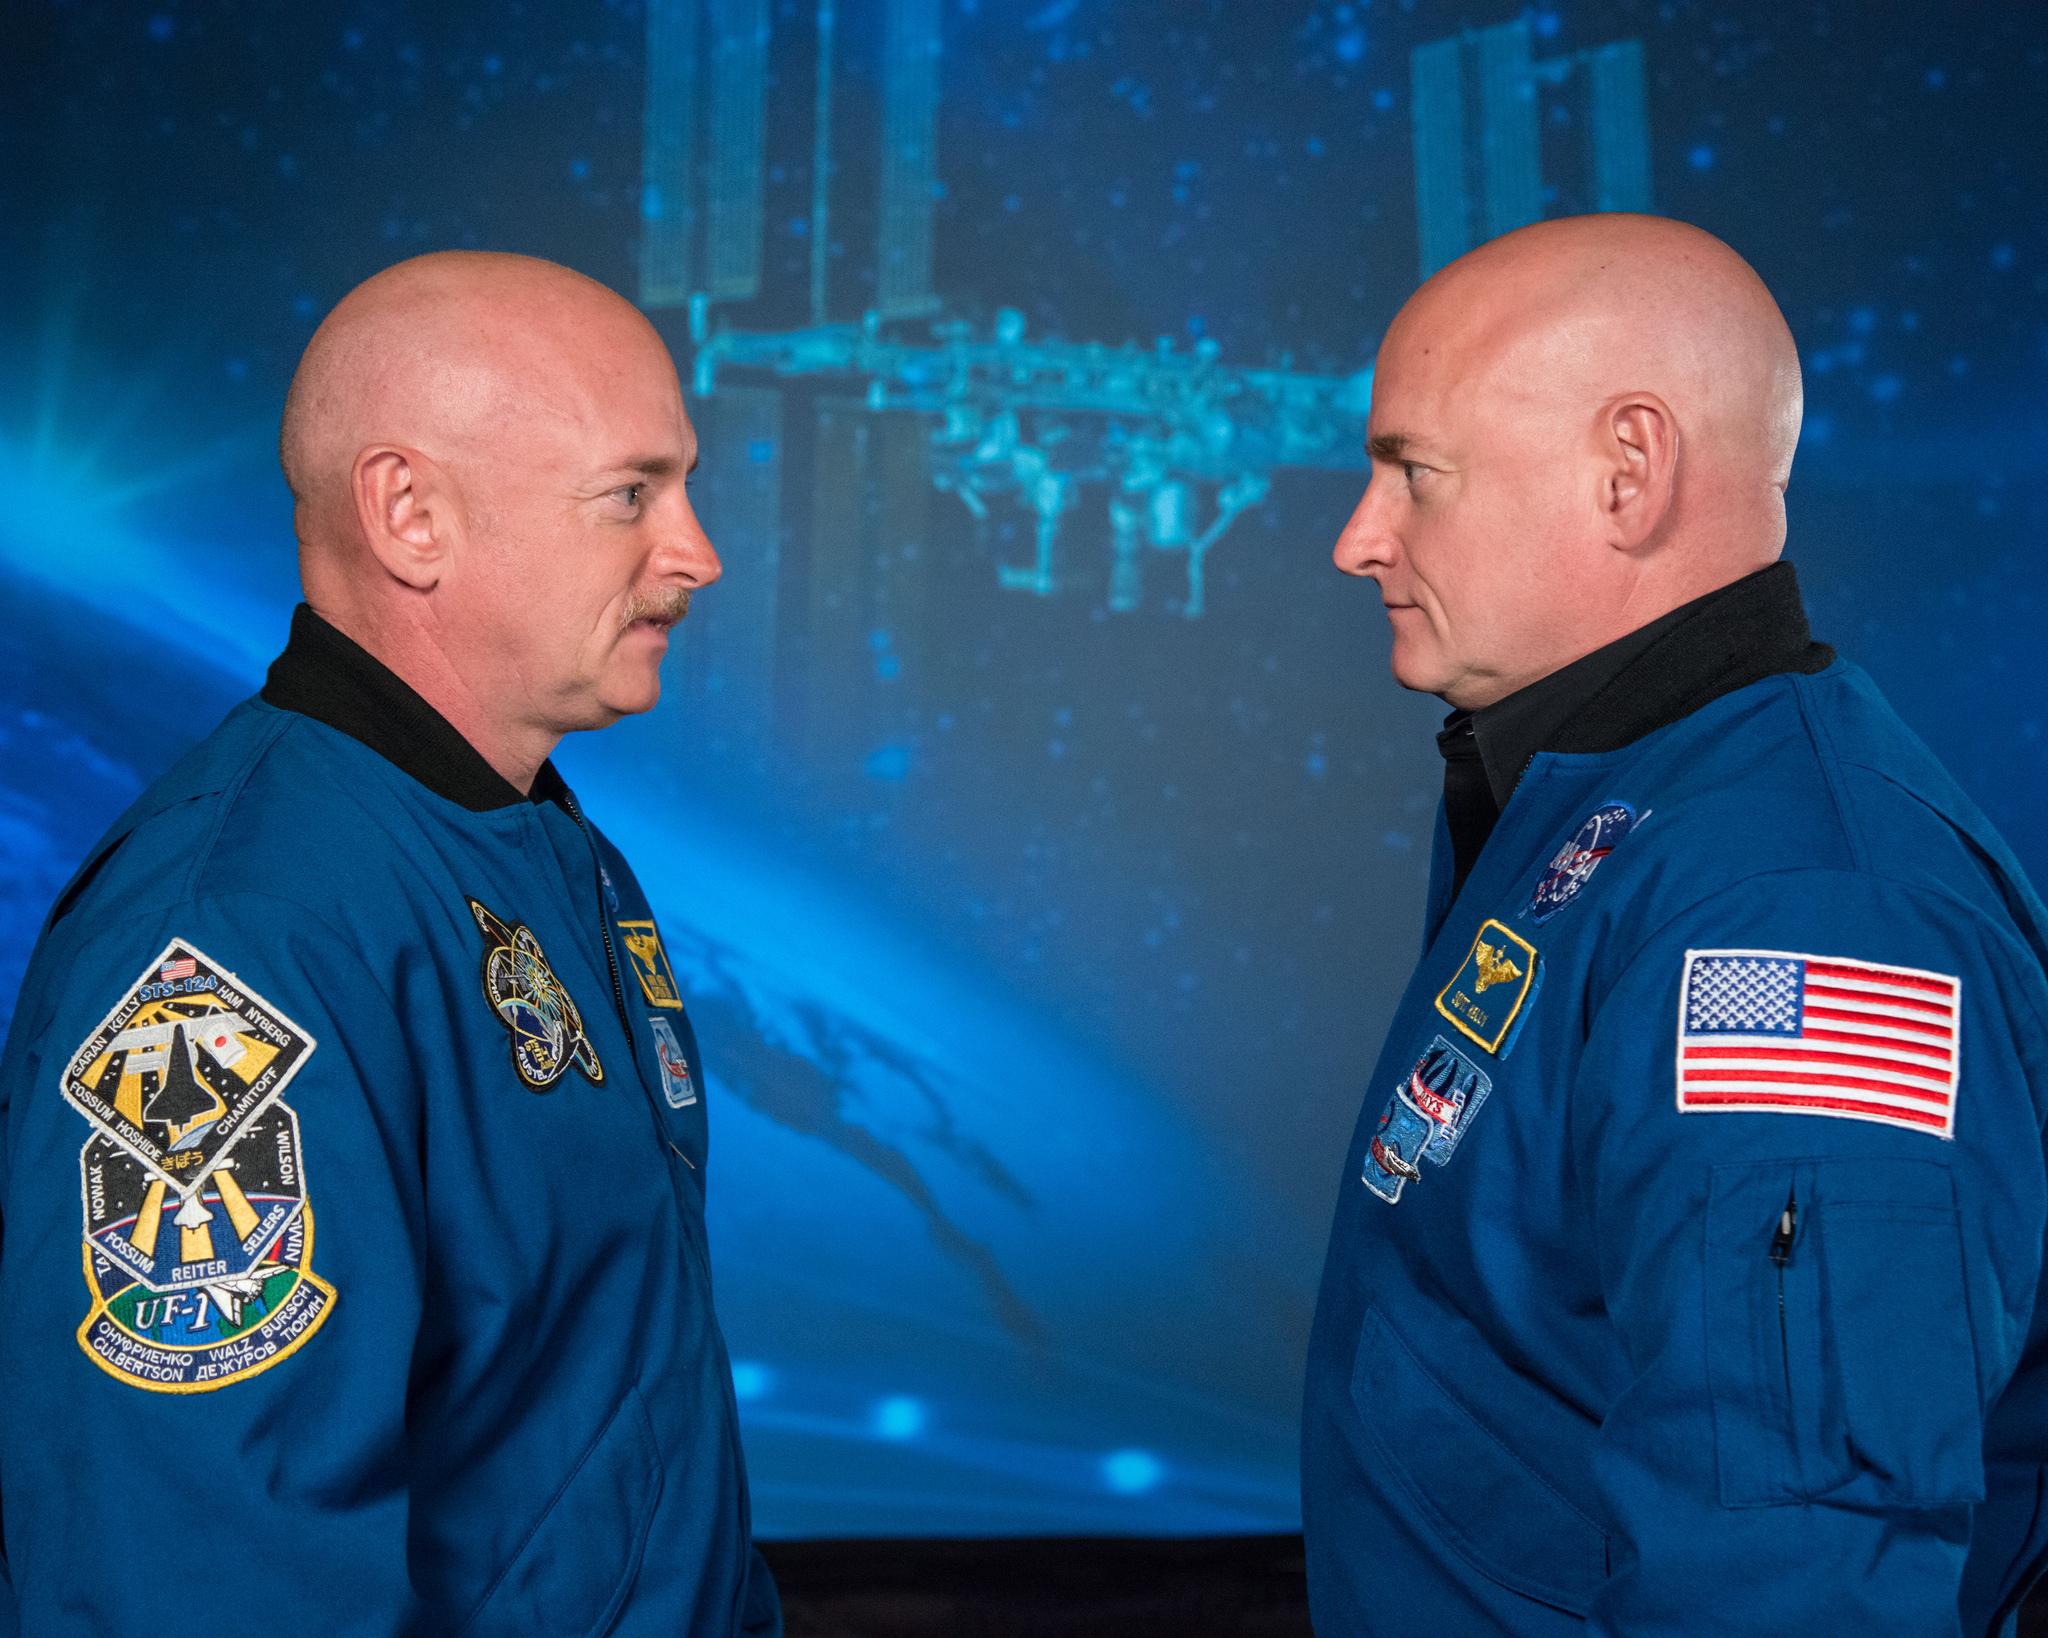 NASA雙胞胎研究 在太空待340天人體會怎樣